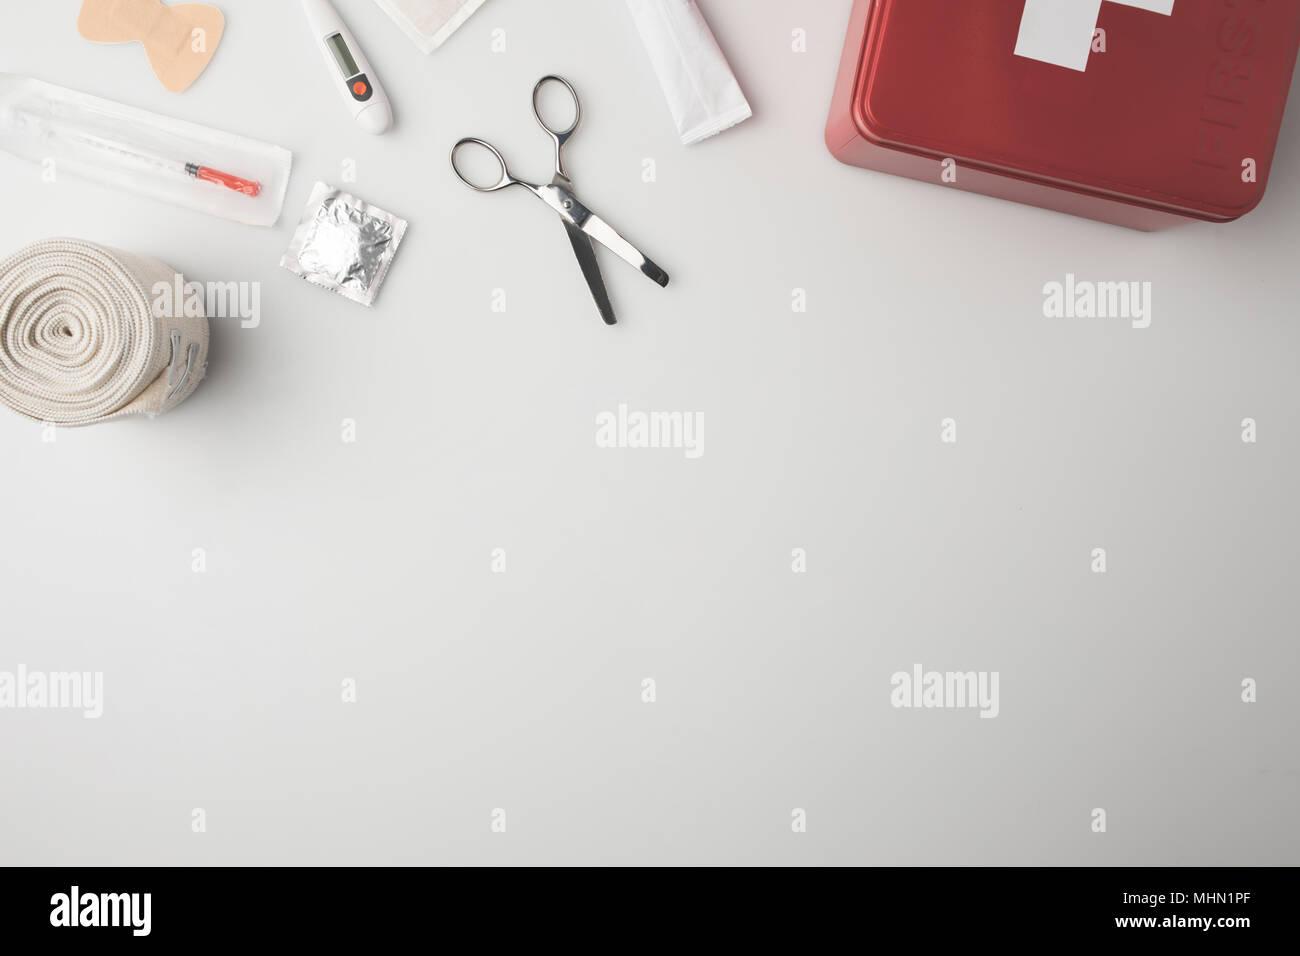 Medical Supplies Stock Photos & Medical Supplies Stock Images - Alamy